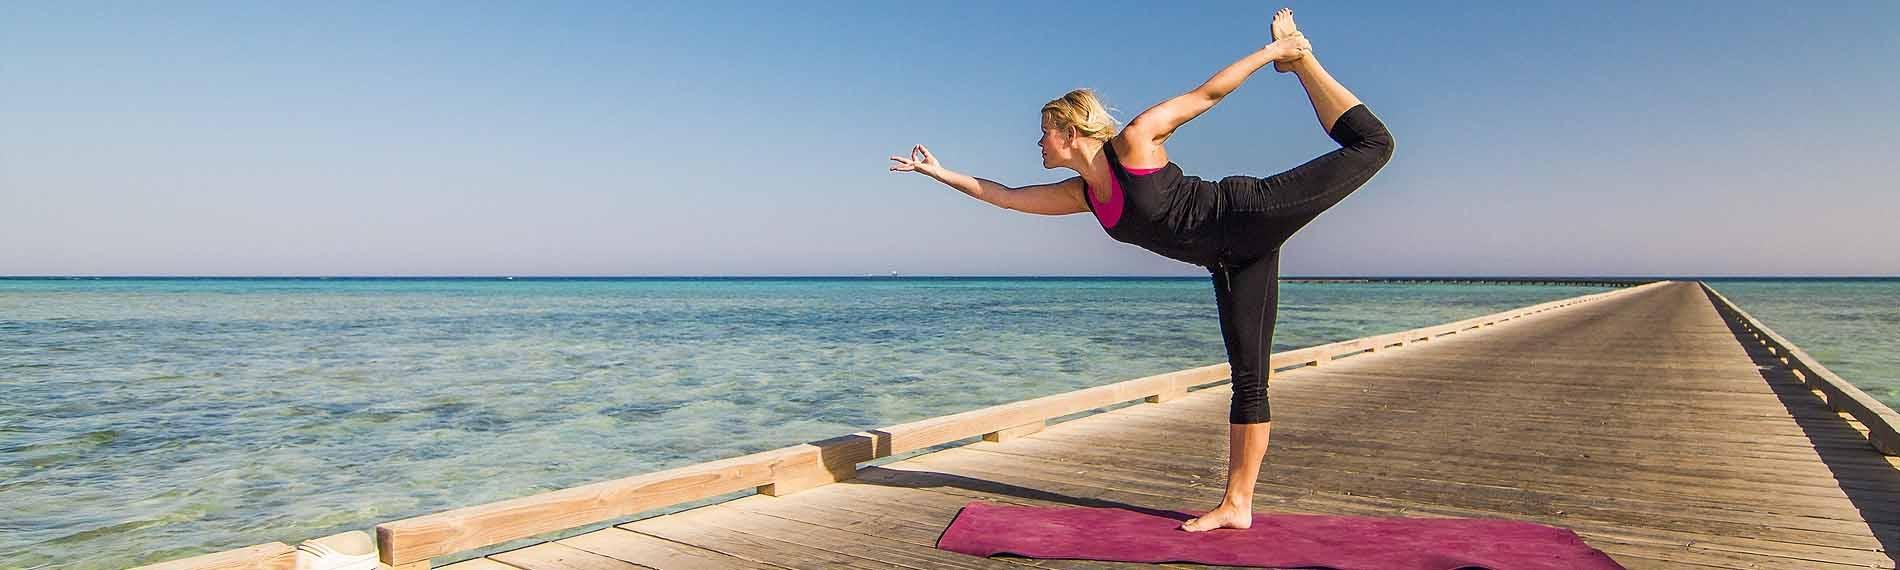 Tauchen und Yoga © The Breakers, Soma Bay